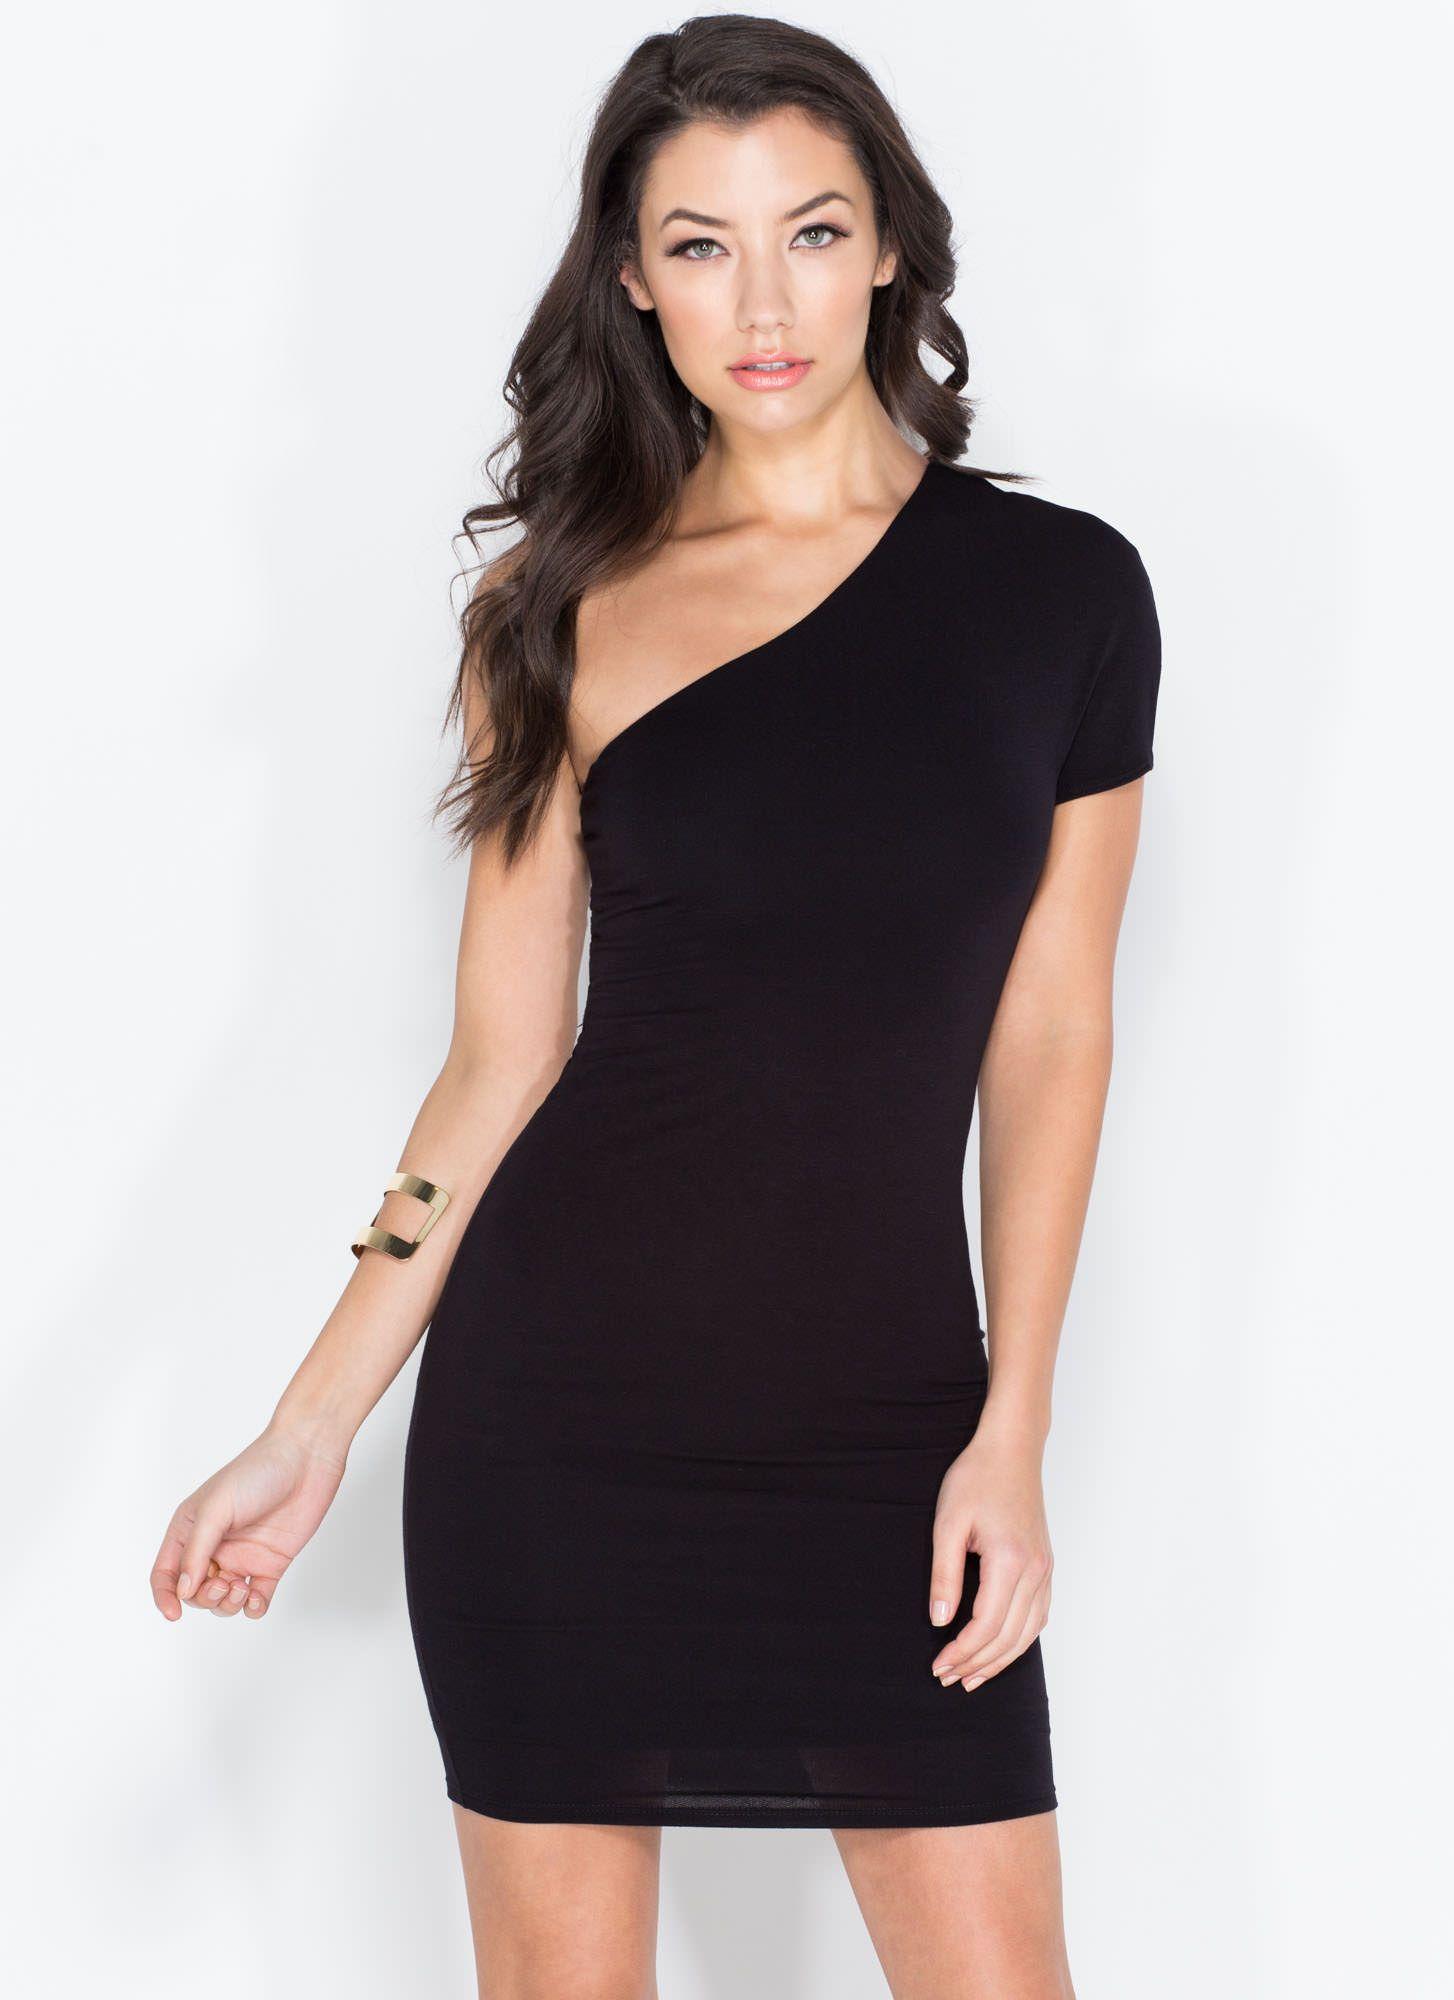 Ombre bodycon black dress for women for men scarves boutique fashion